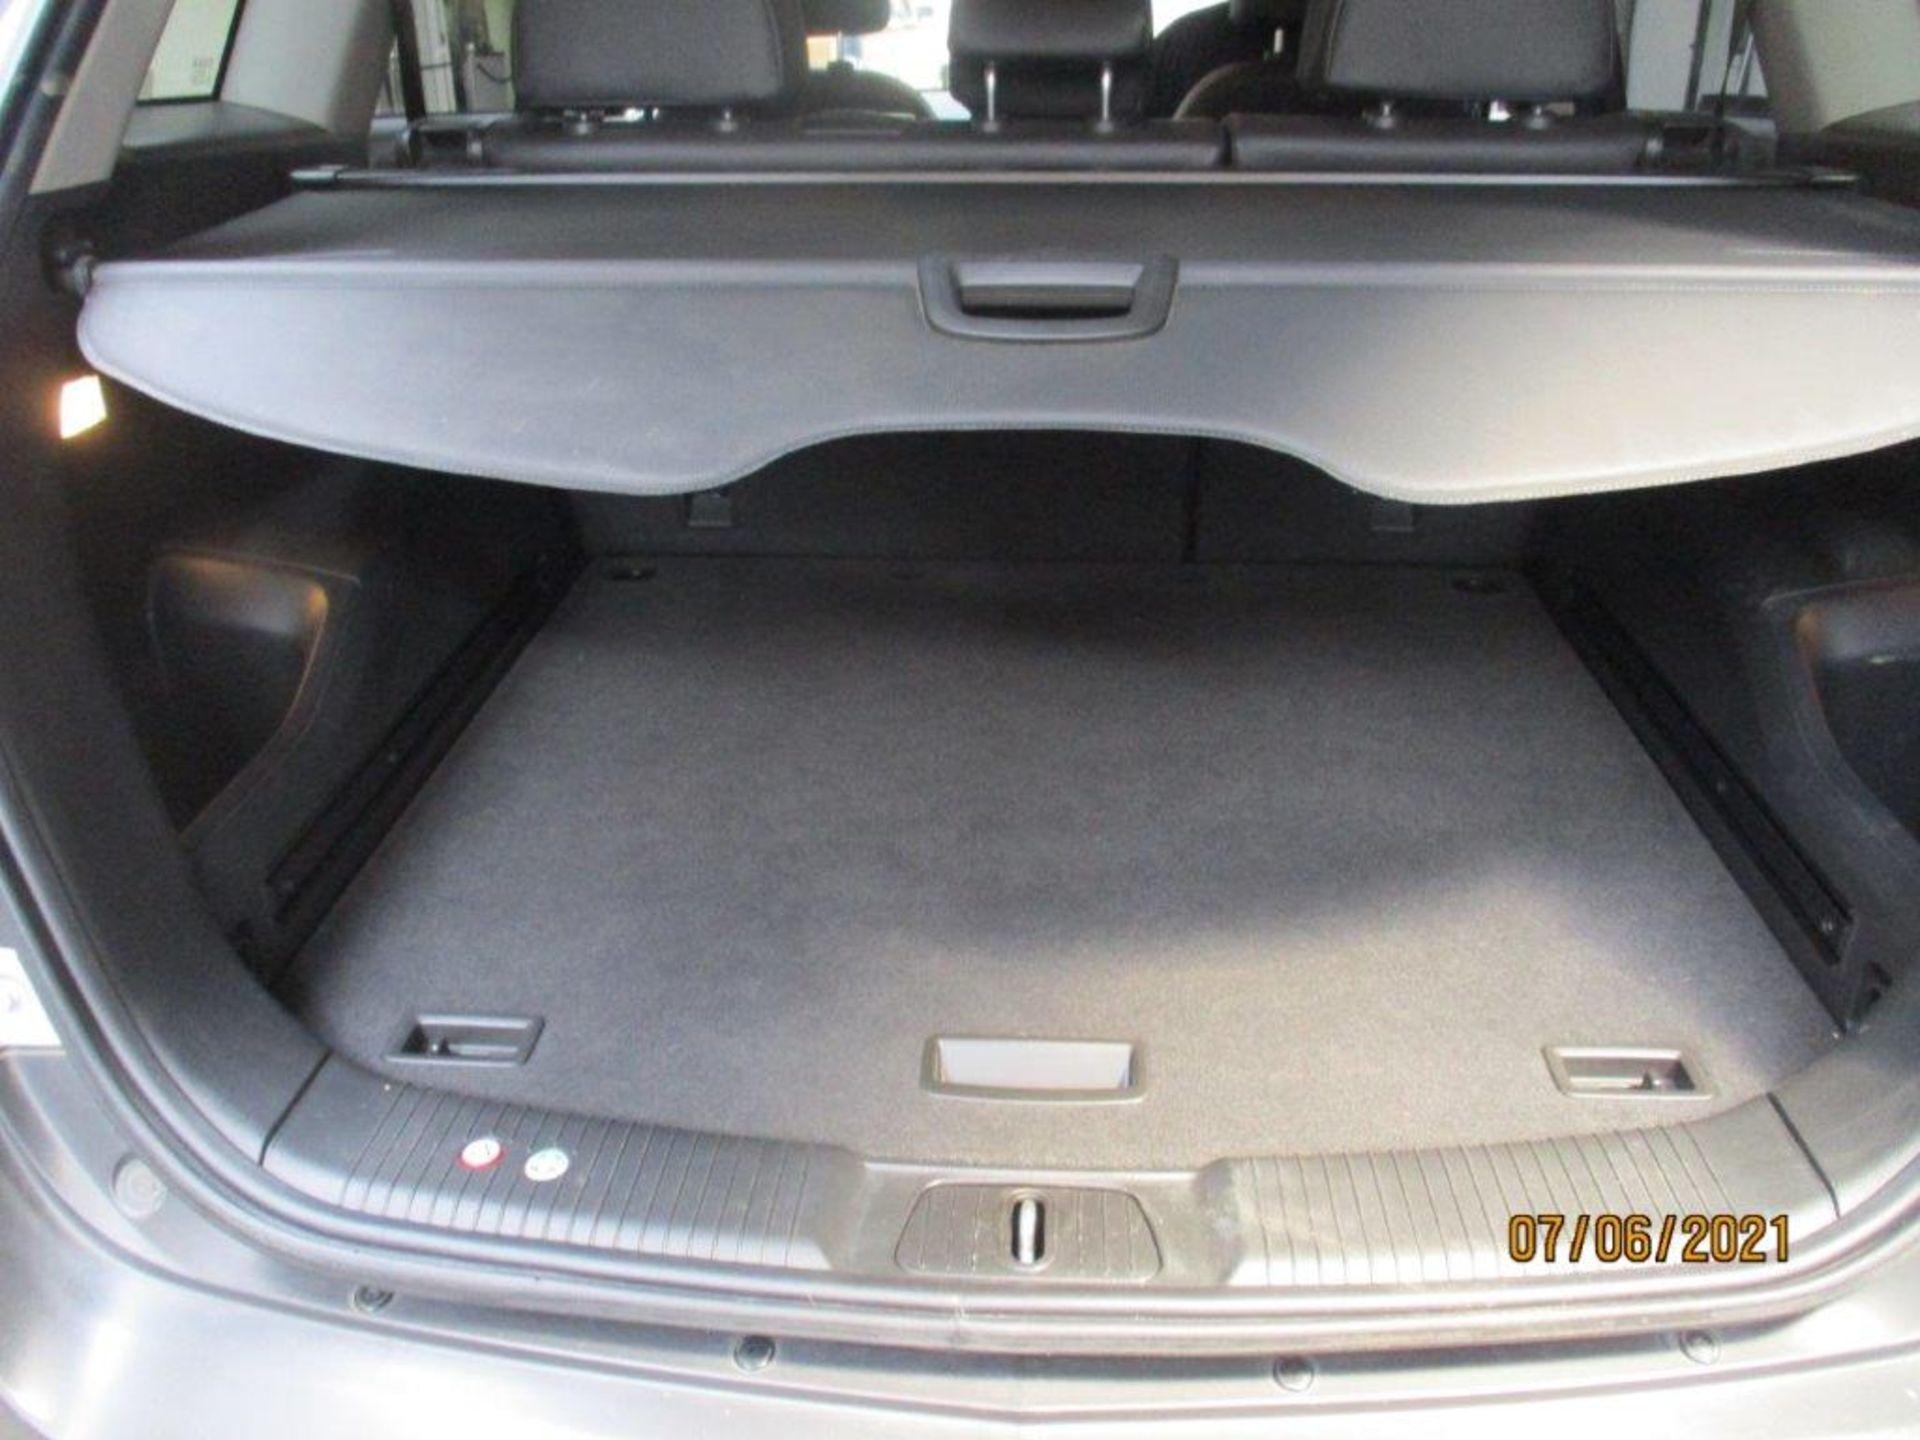 12 12 Vauxhall Antara Excl CDTI - Image 18 of 18